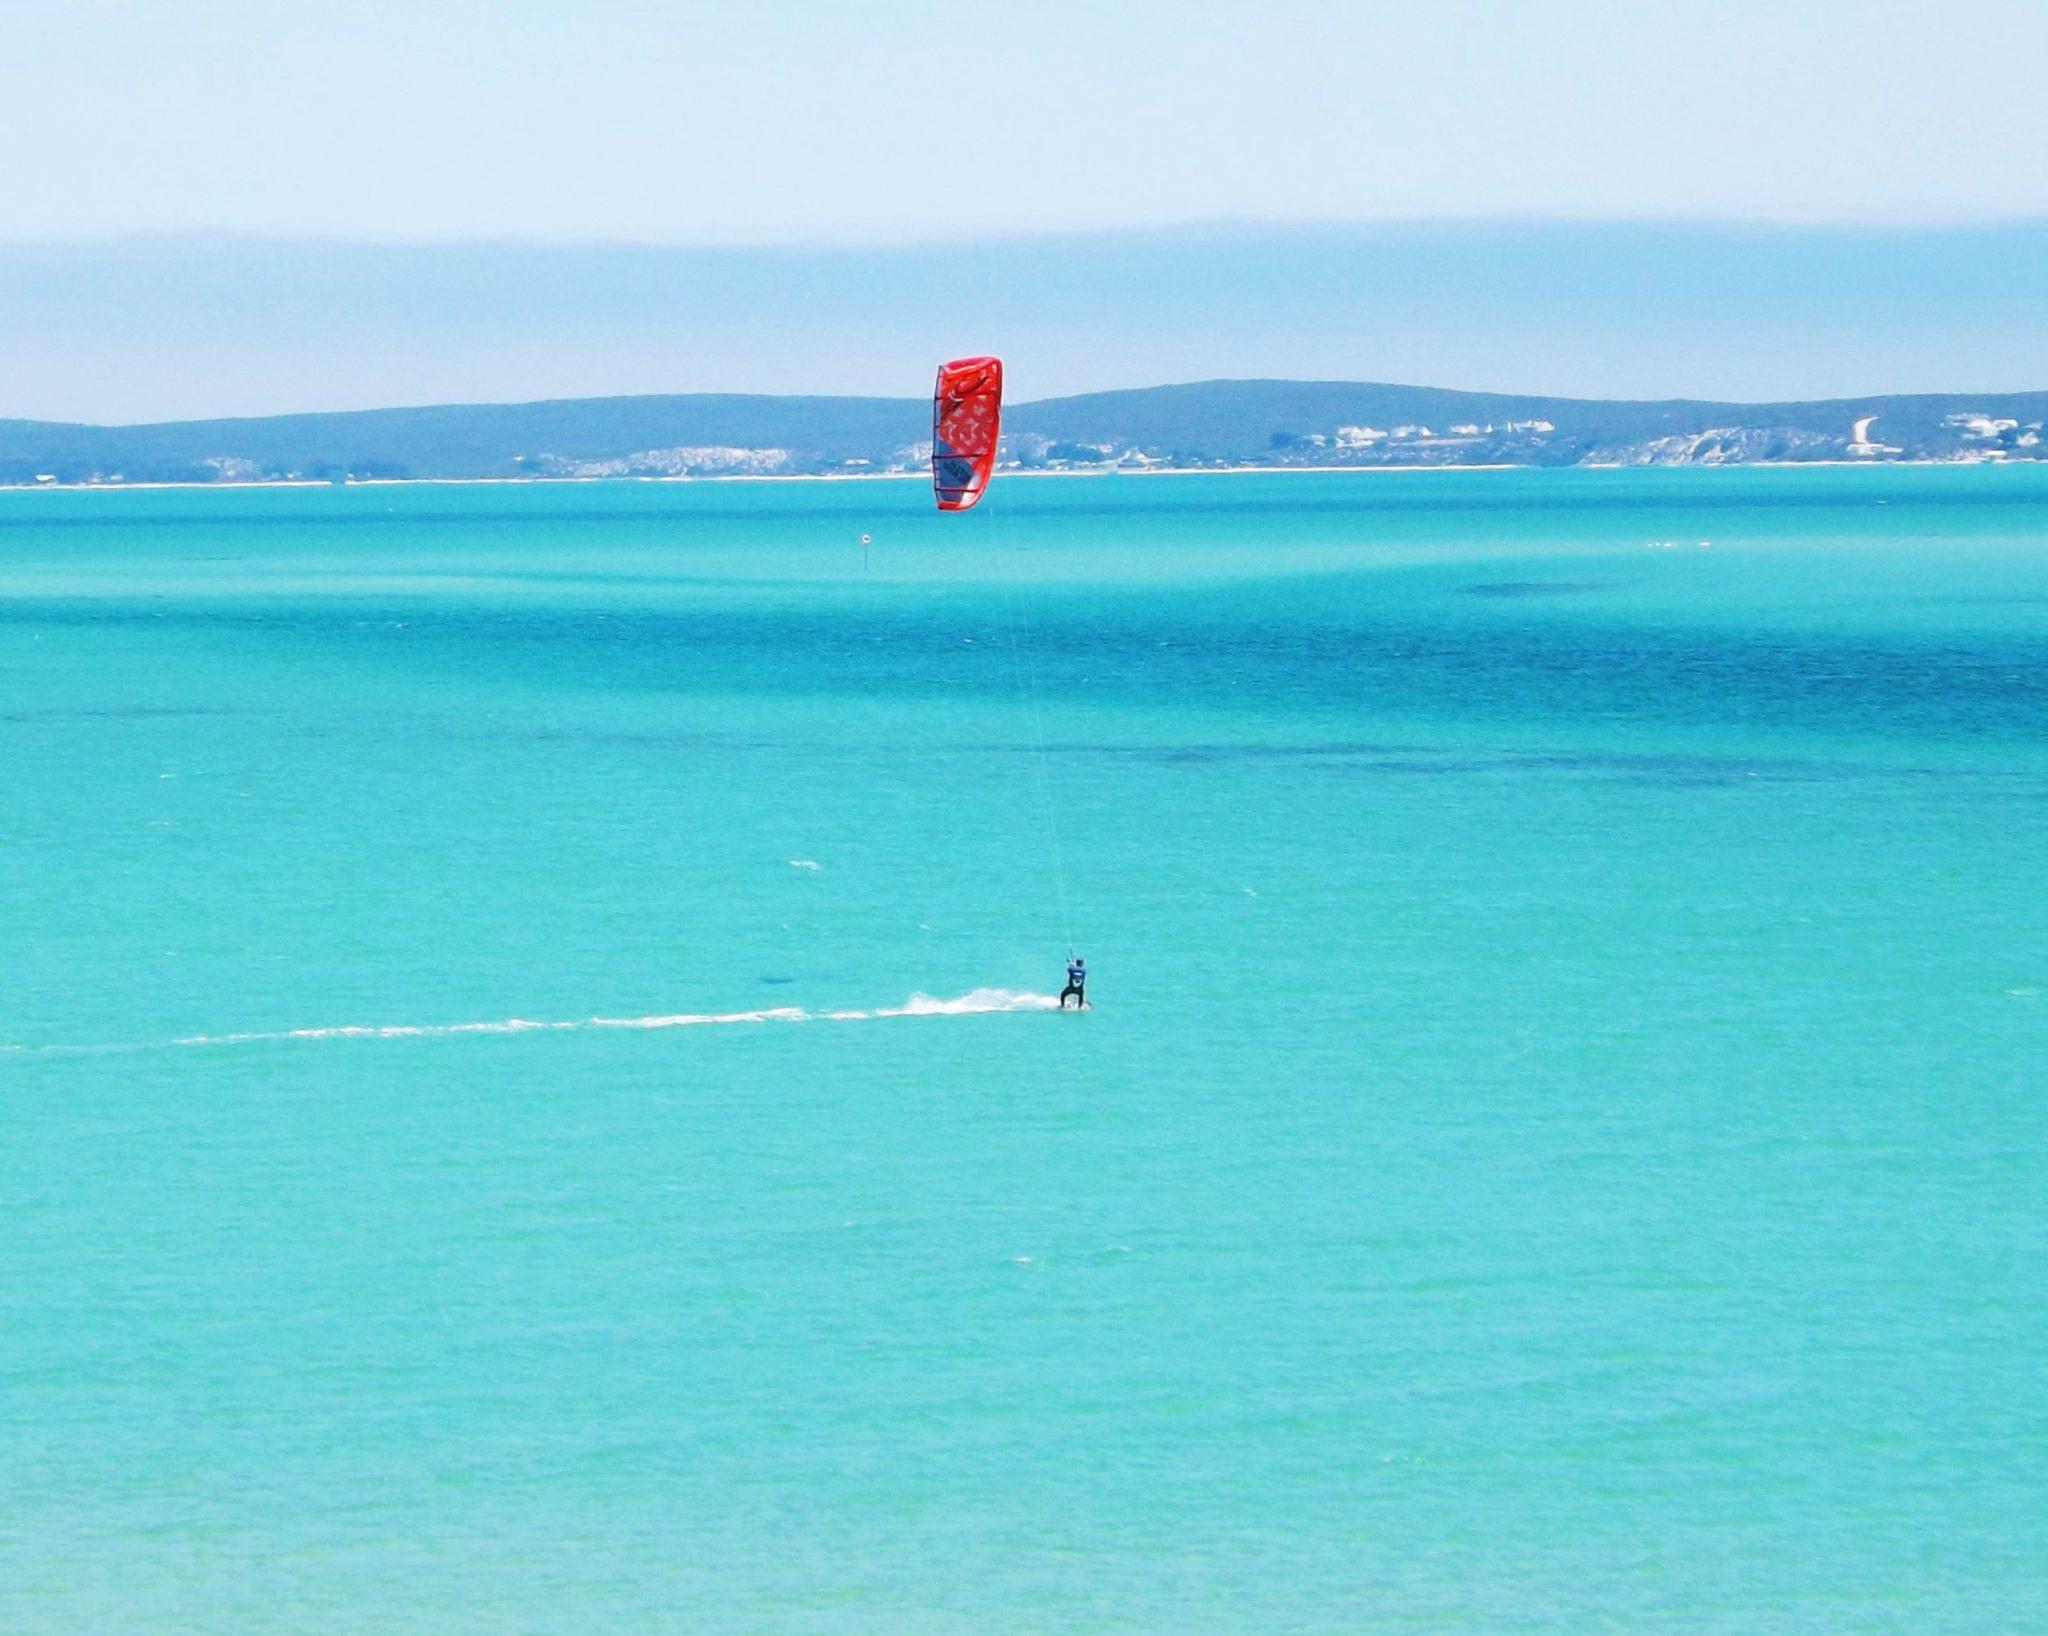 TheKiteGuru discount: 17% off kitesurfing adventures in South Africa